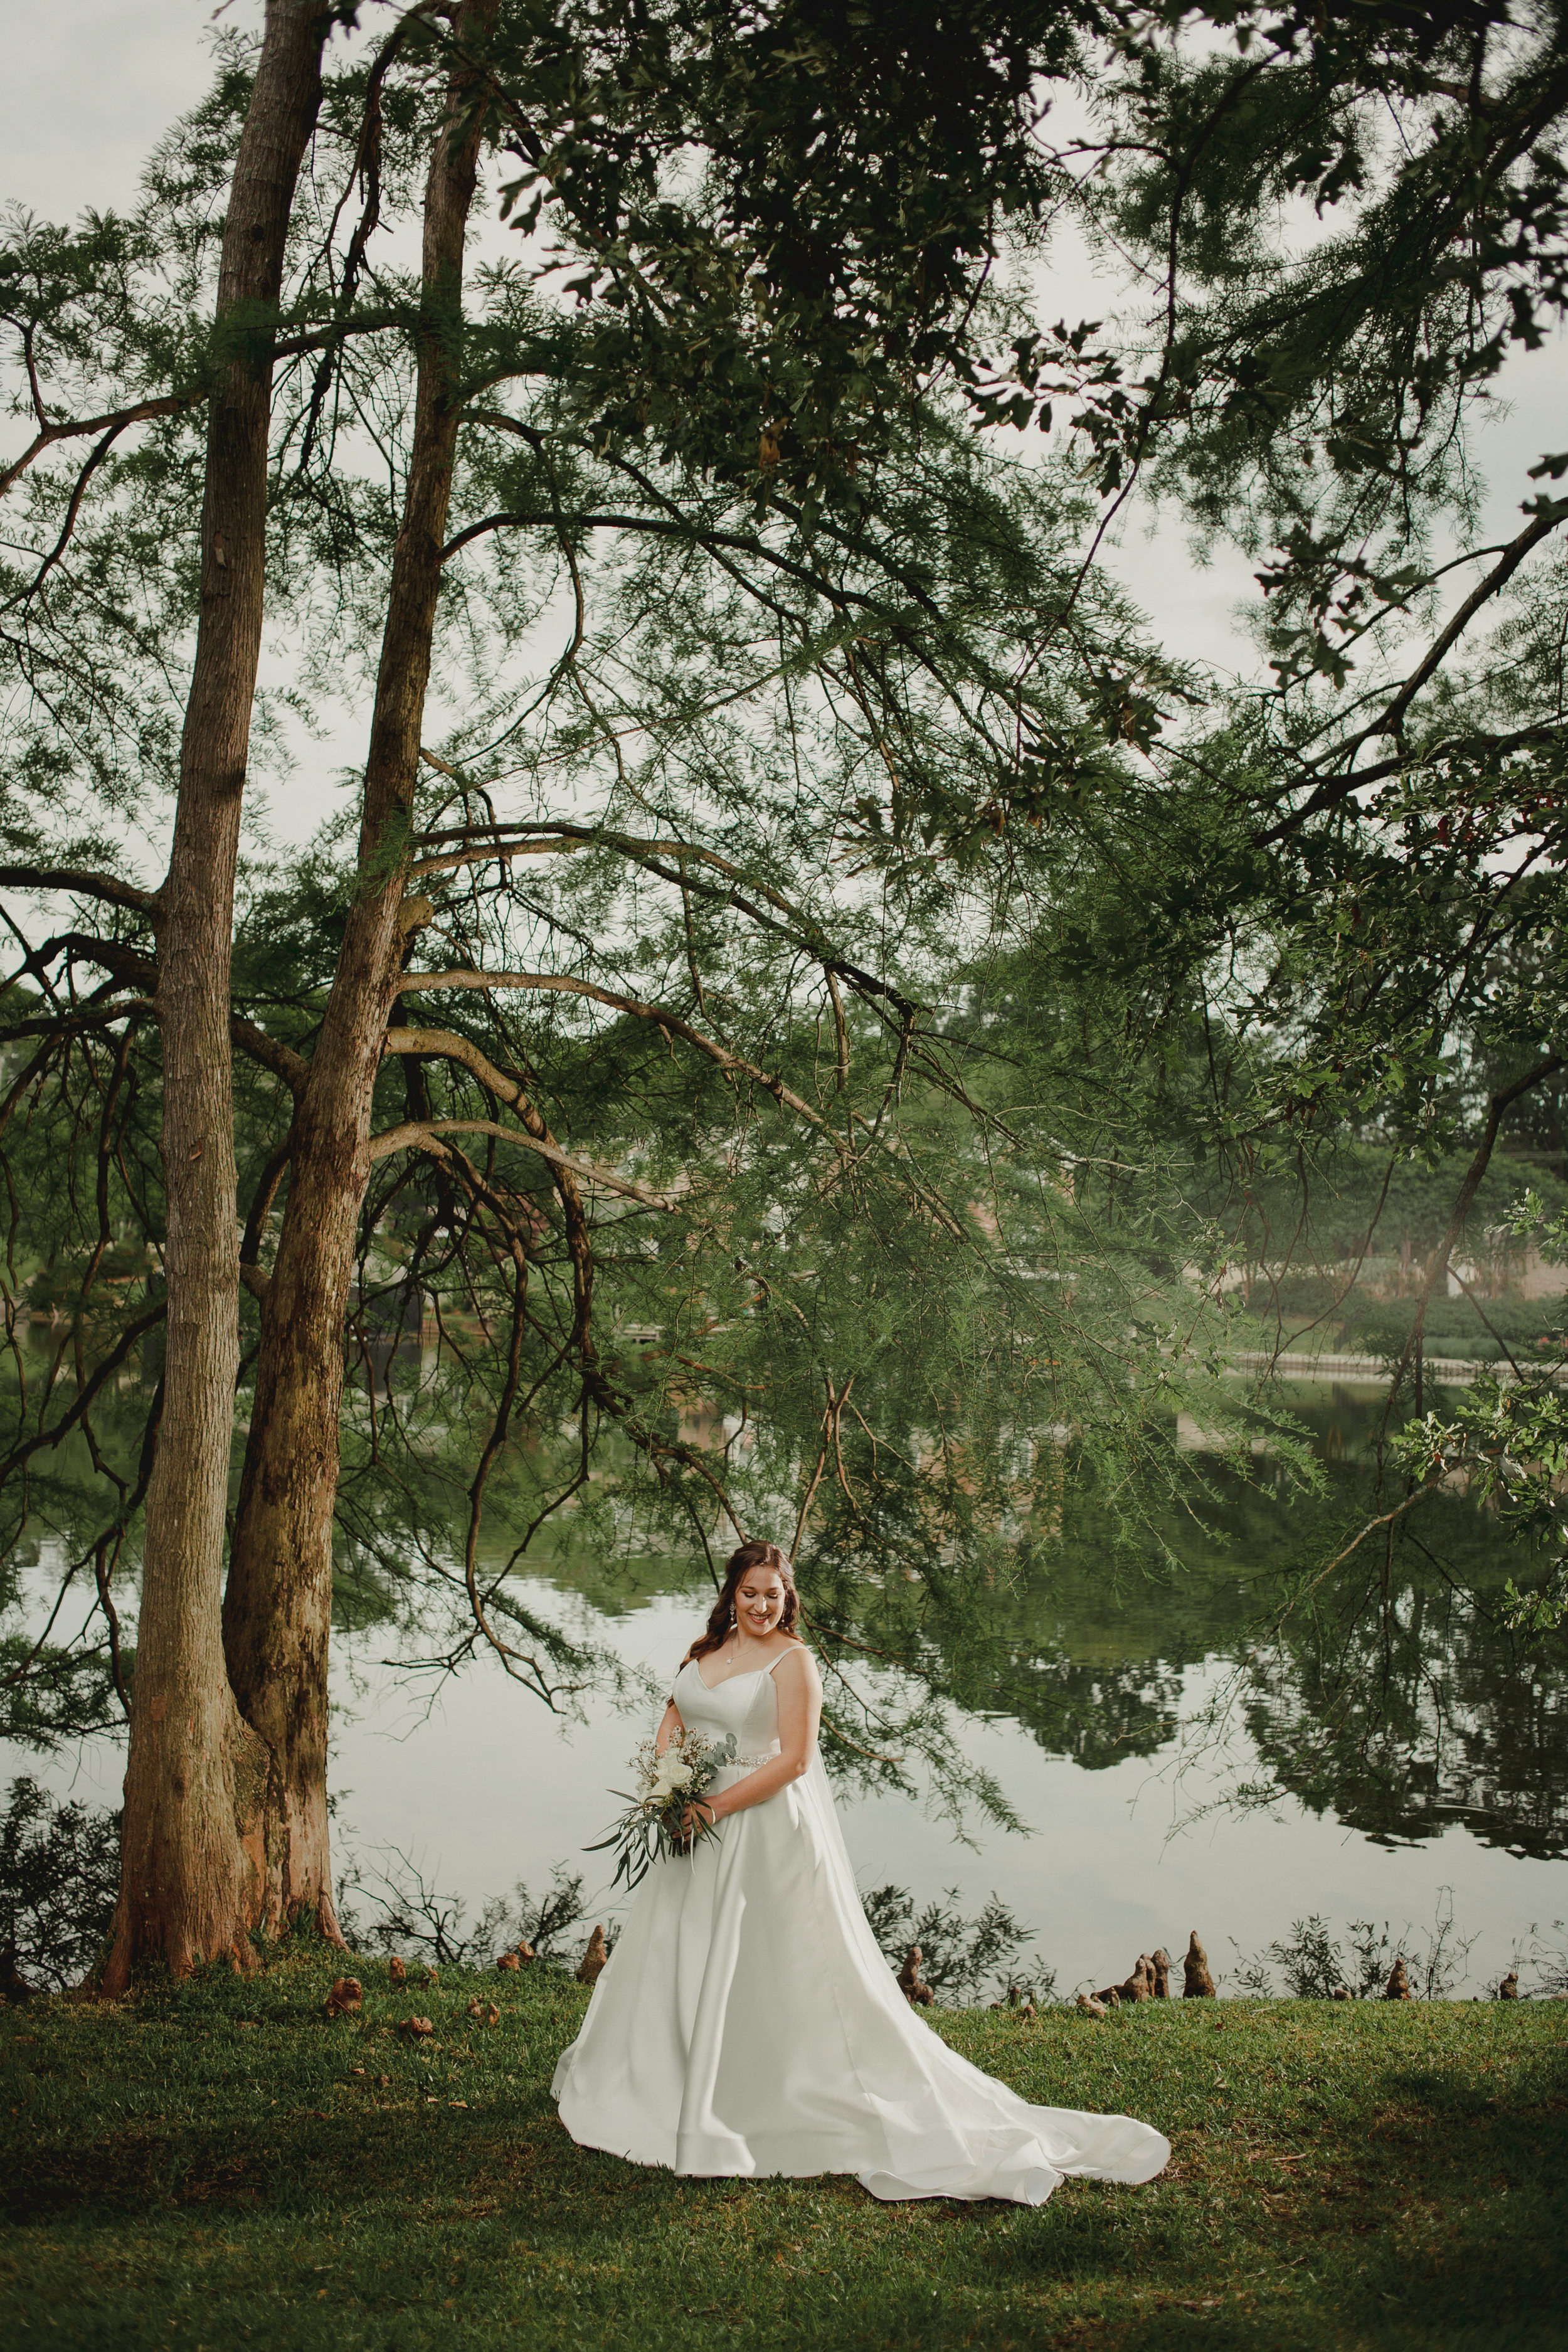 monroe-wedding-photographer-7.jpg